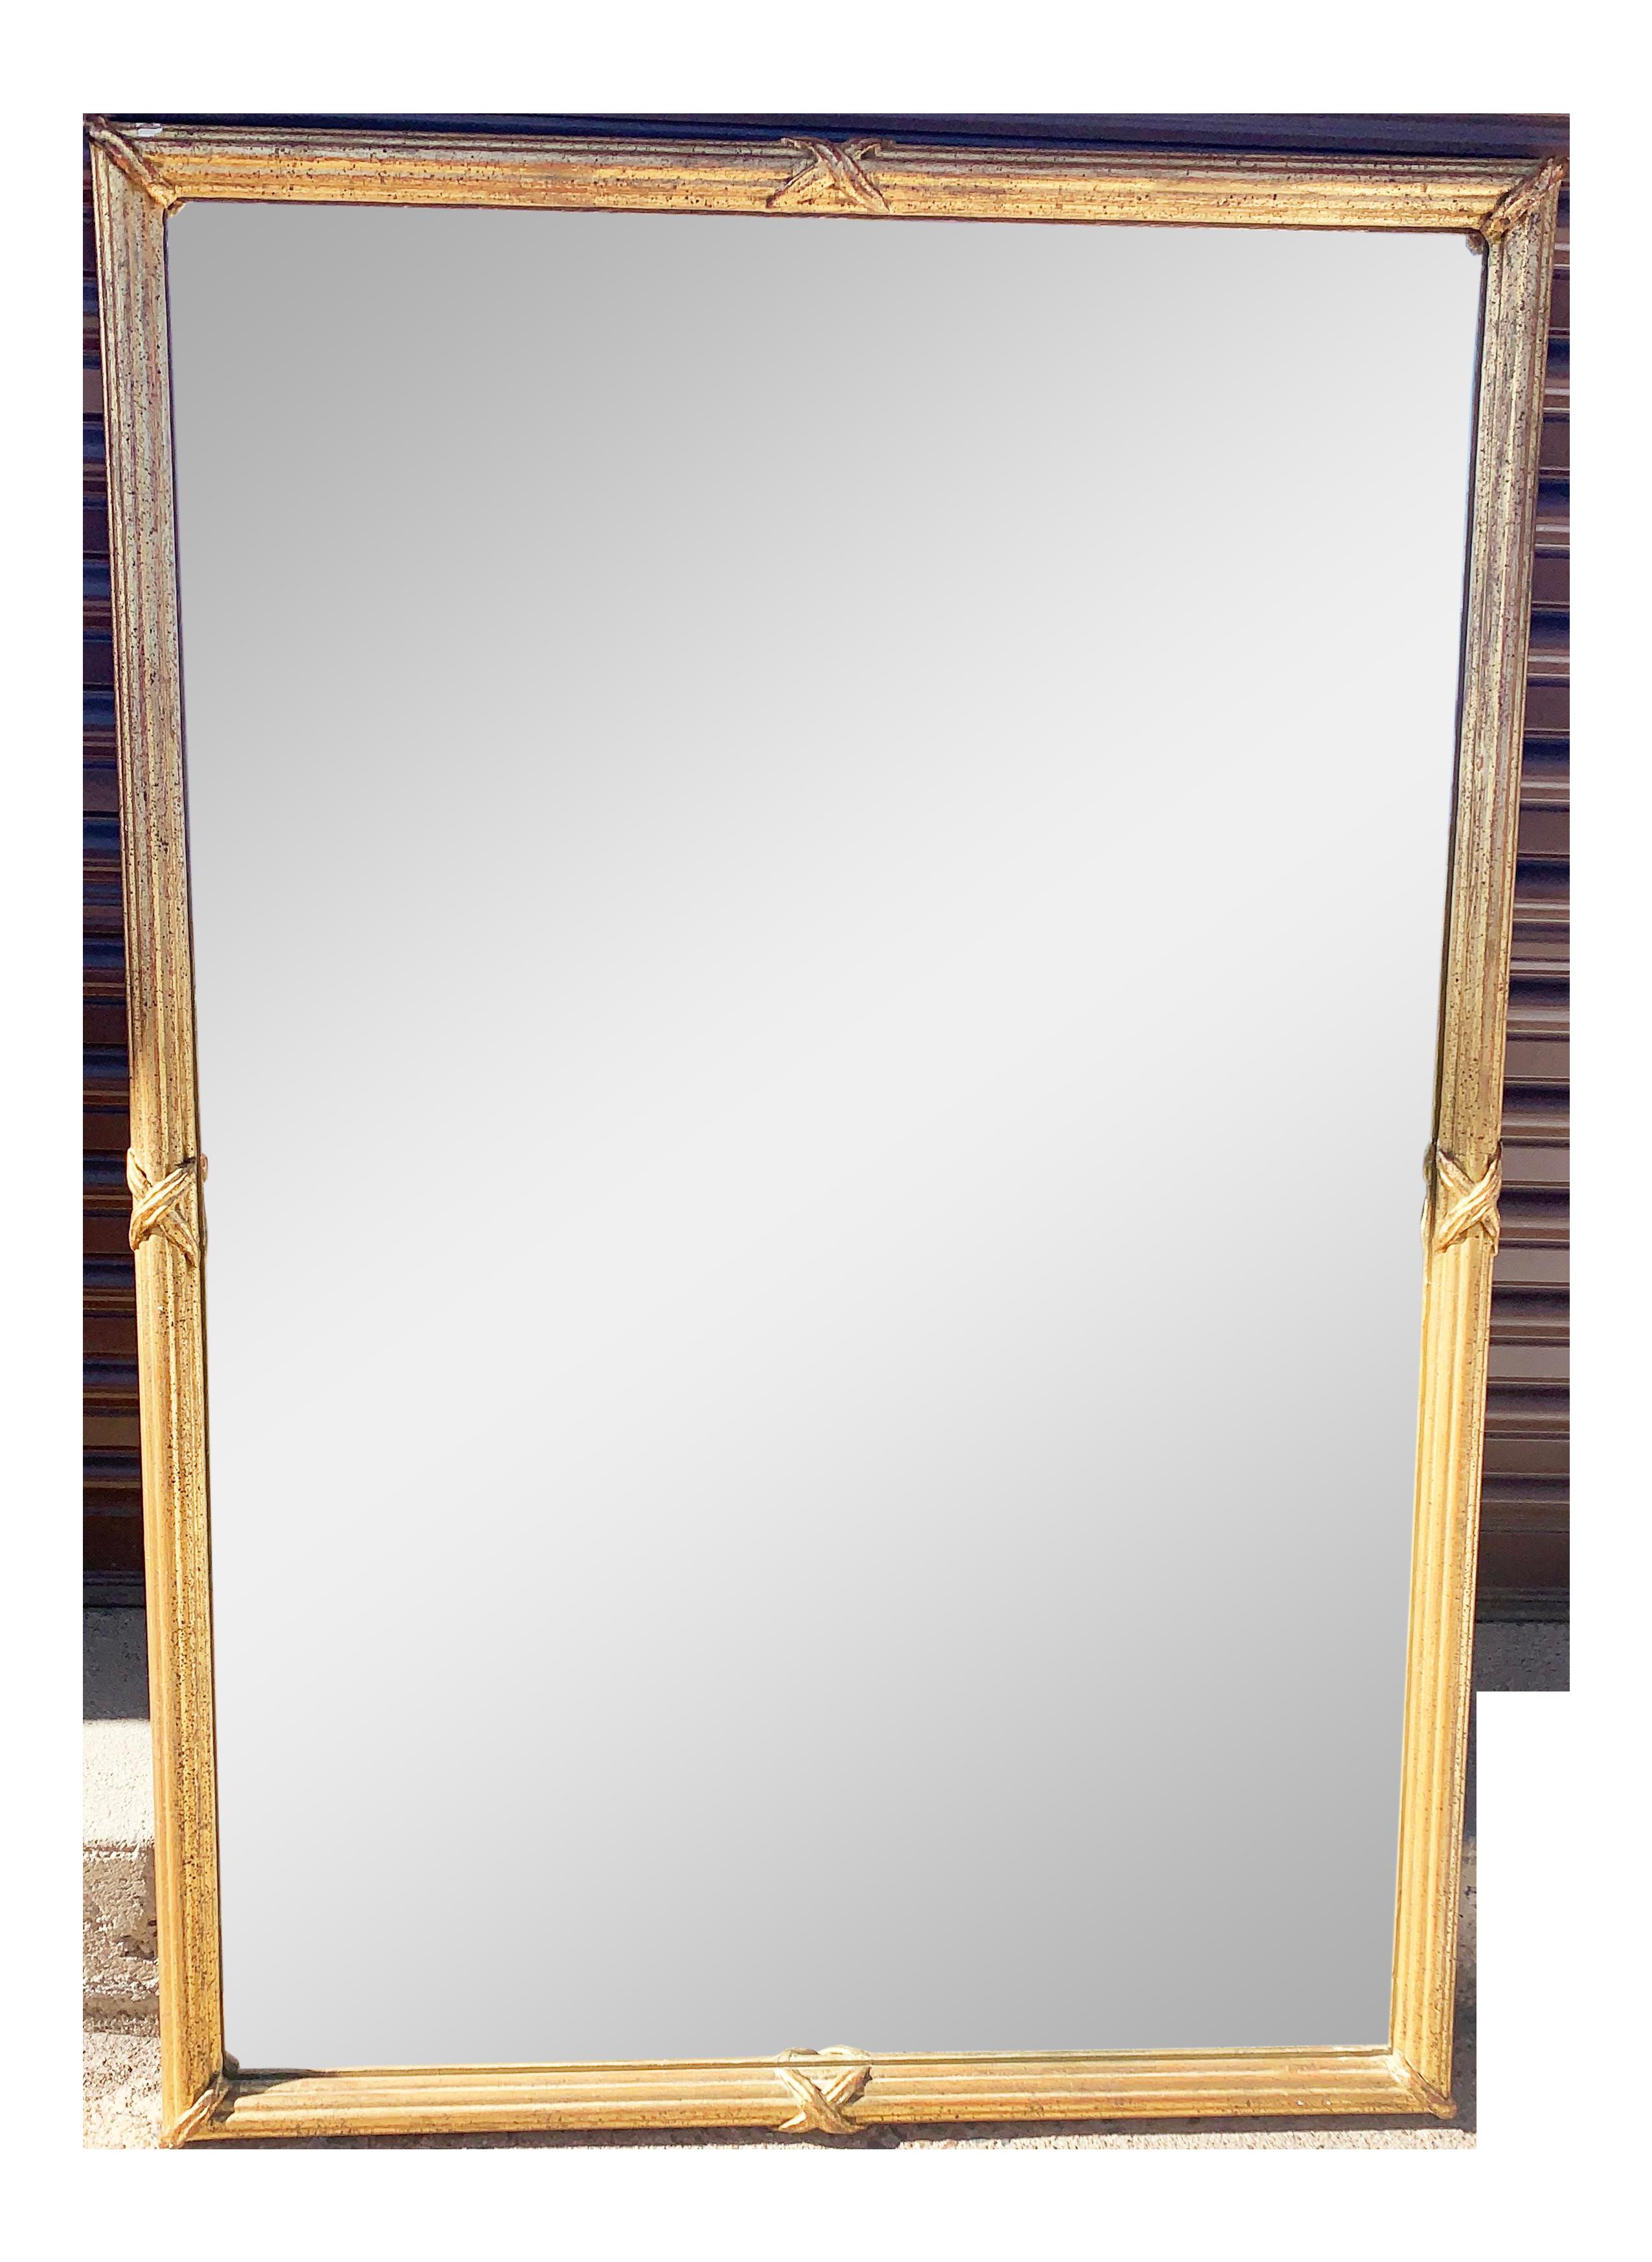 1950s Large Gold Leaf Framed Mirror Mirror Large Gold Mirror Mirror Frames